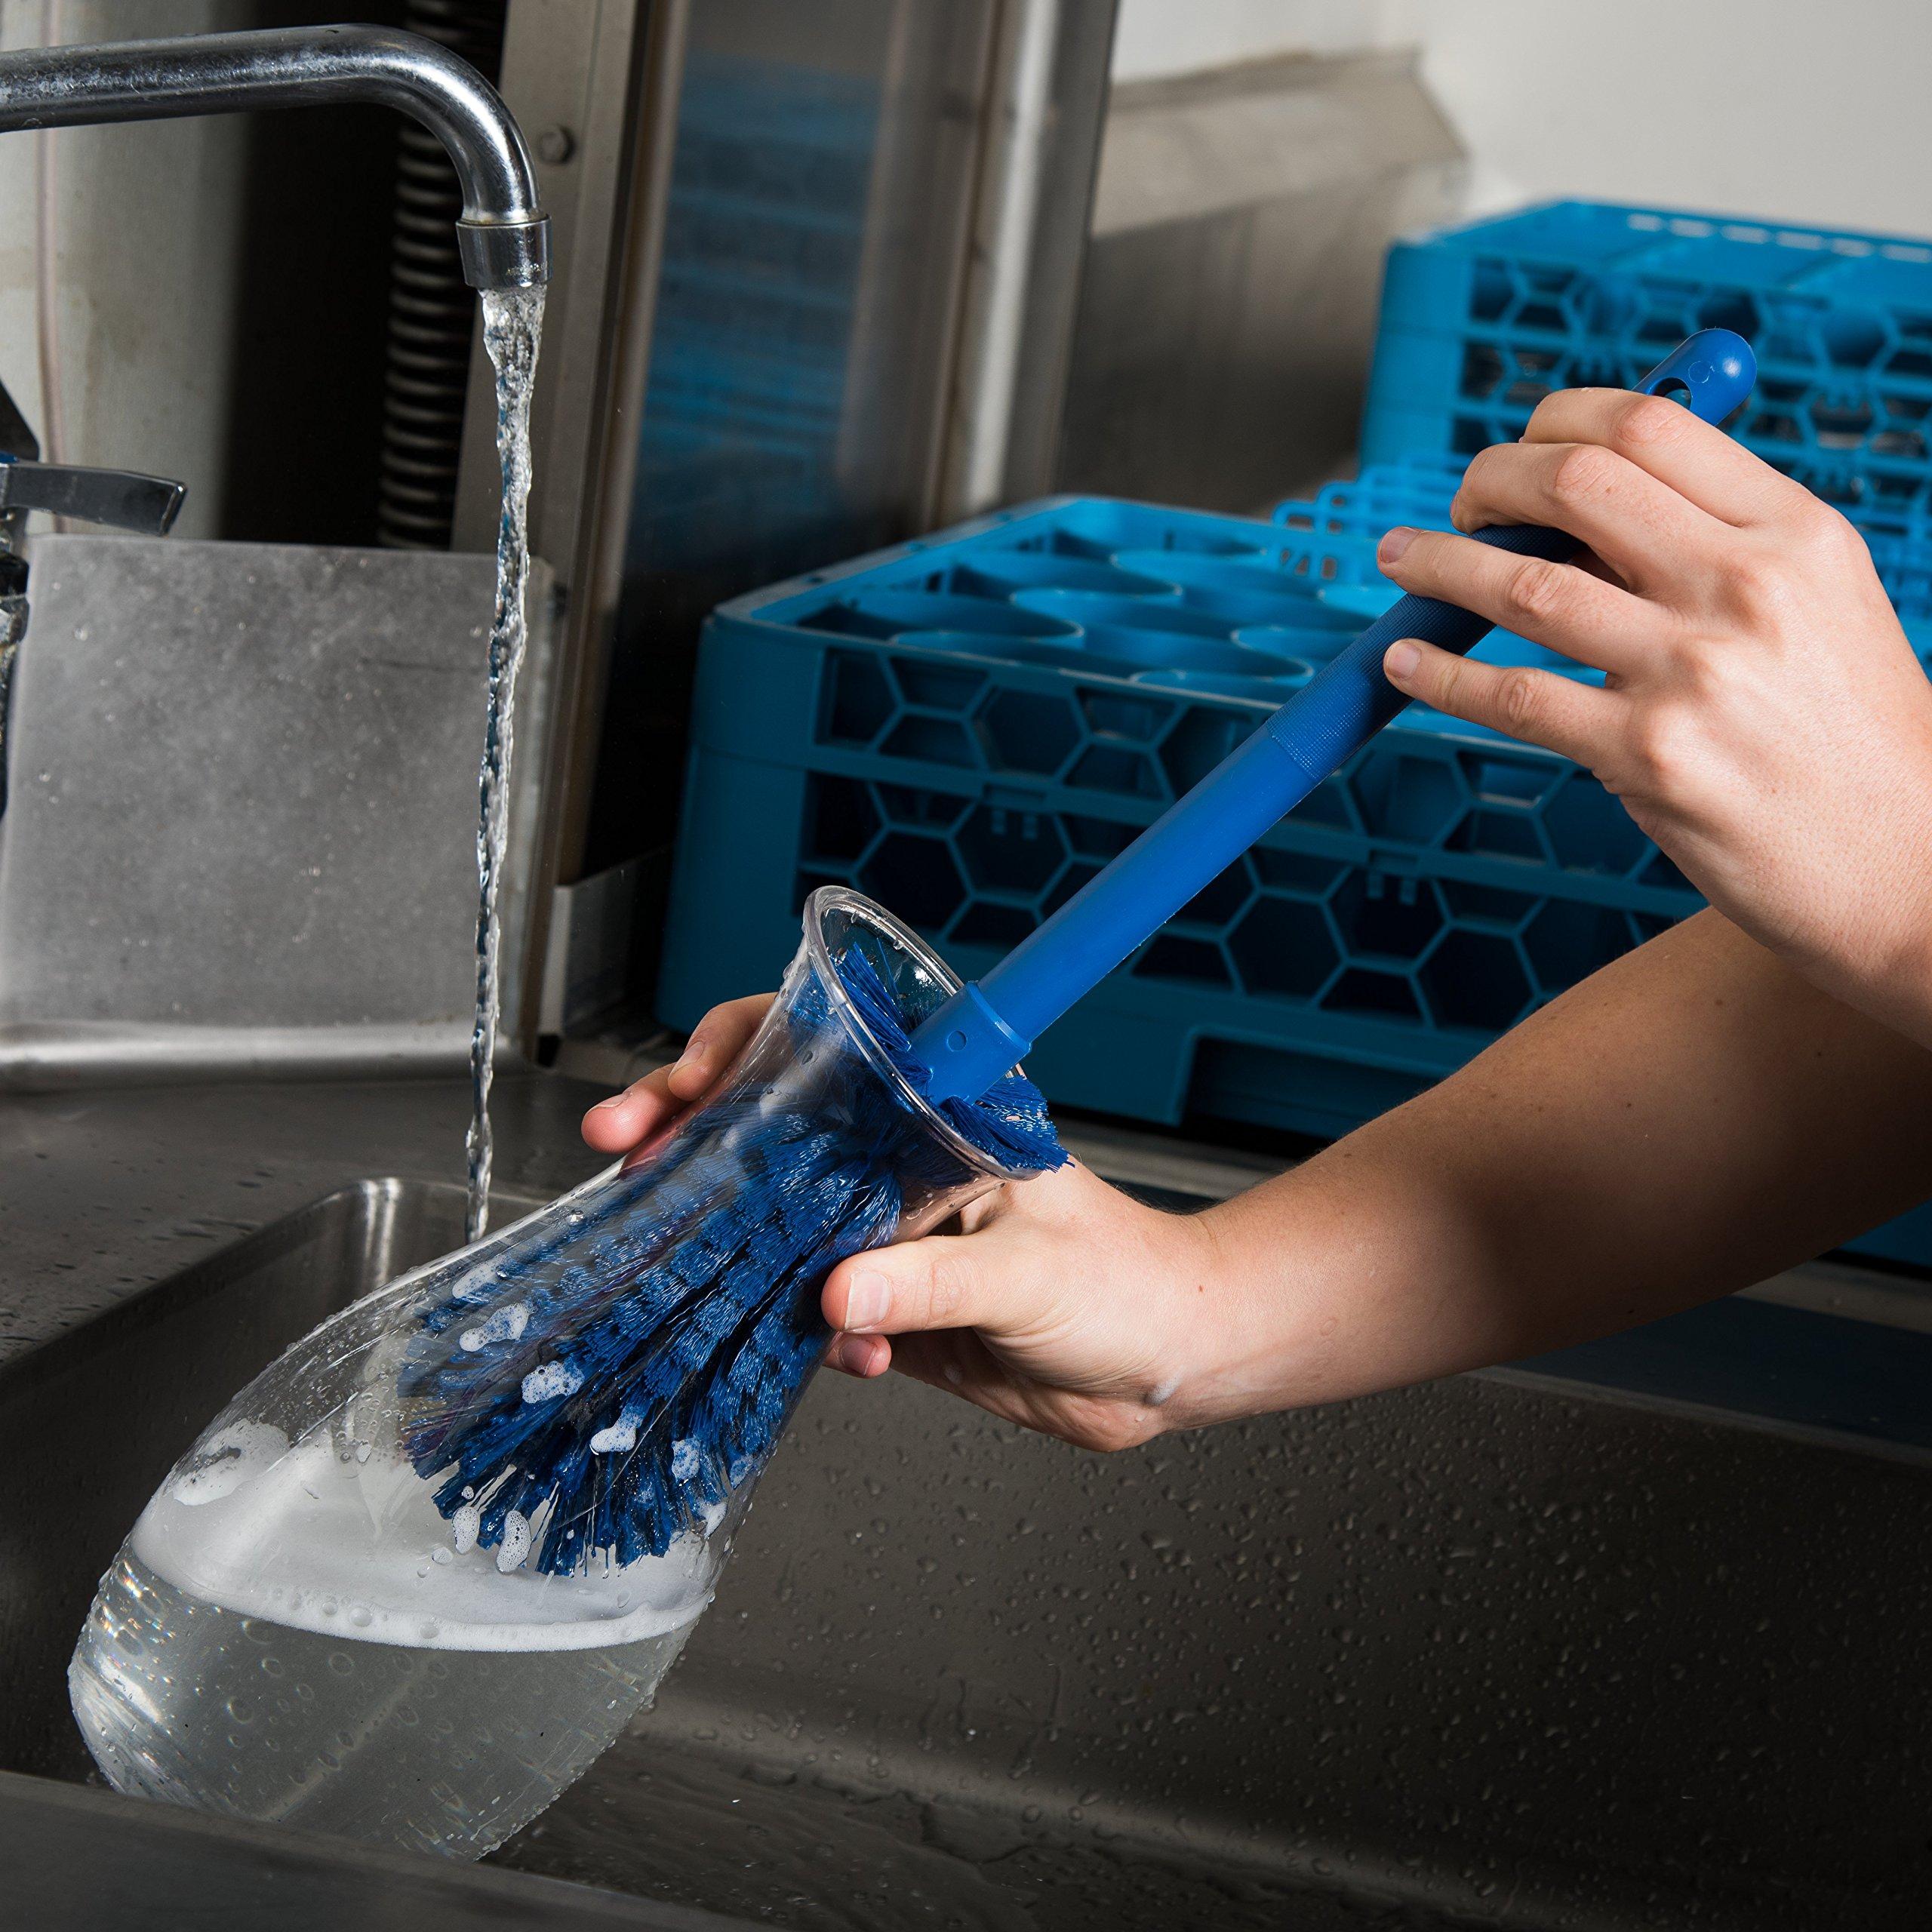 Carlisle 40001C14 Commercial Bottle Brush, Polyester Bristles, 16'' Length, Blue (Pack of 6) by Carlisle (Image #5)